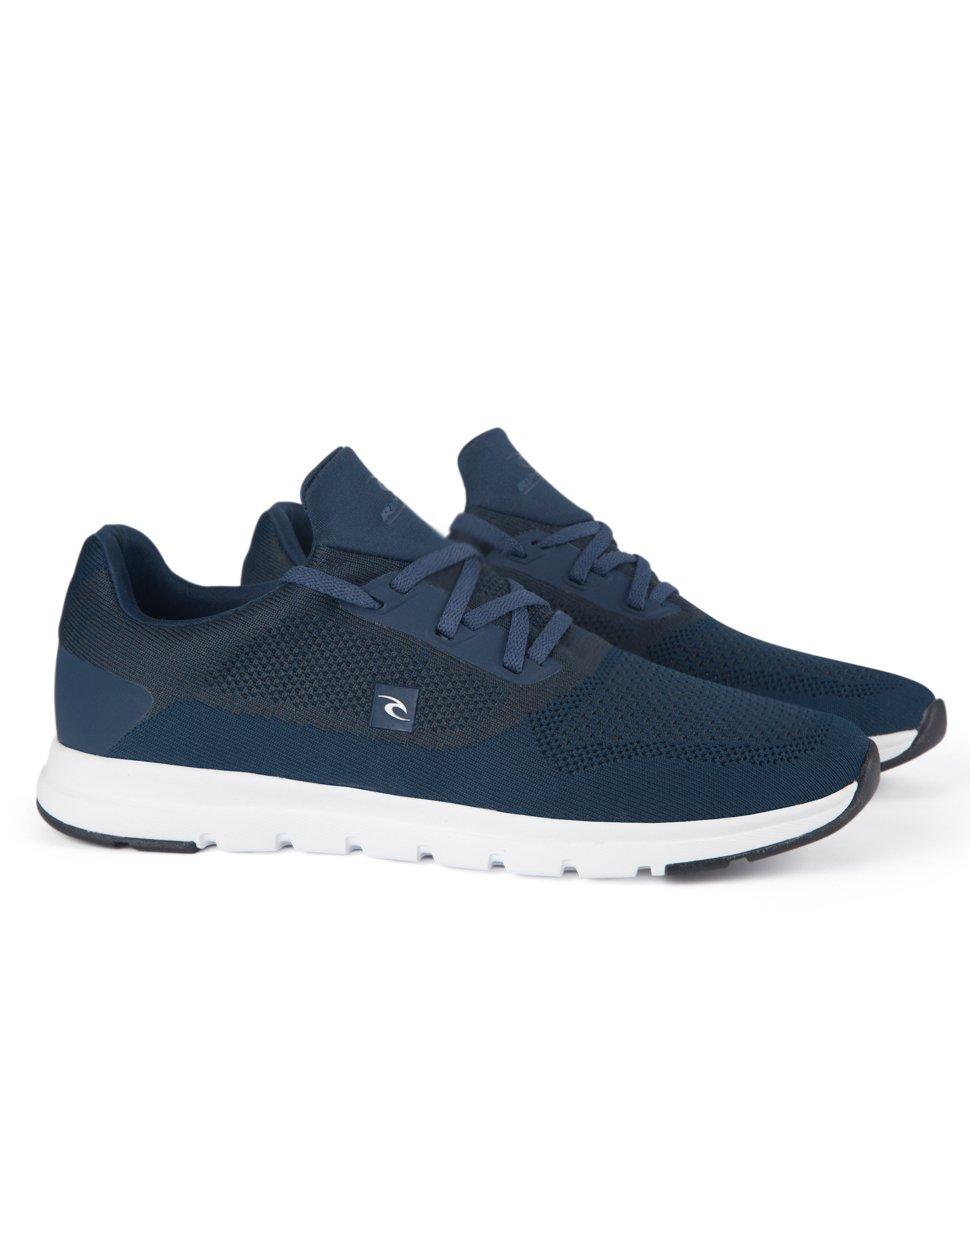 Rip Curl Roamer Knit Shoe Blue